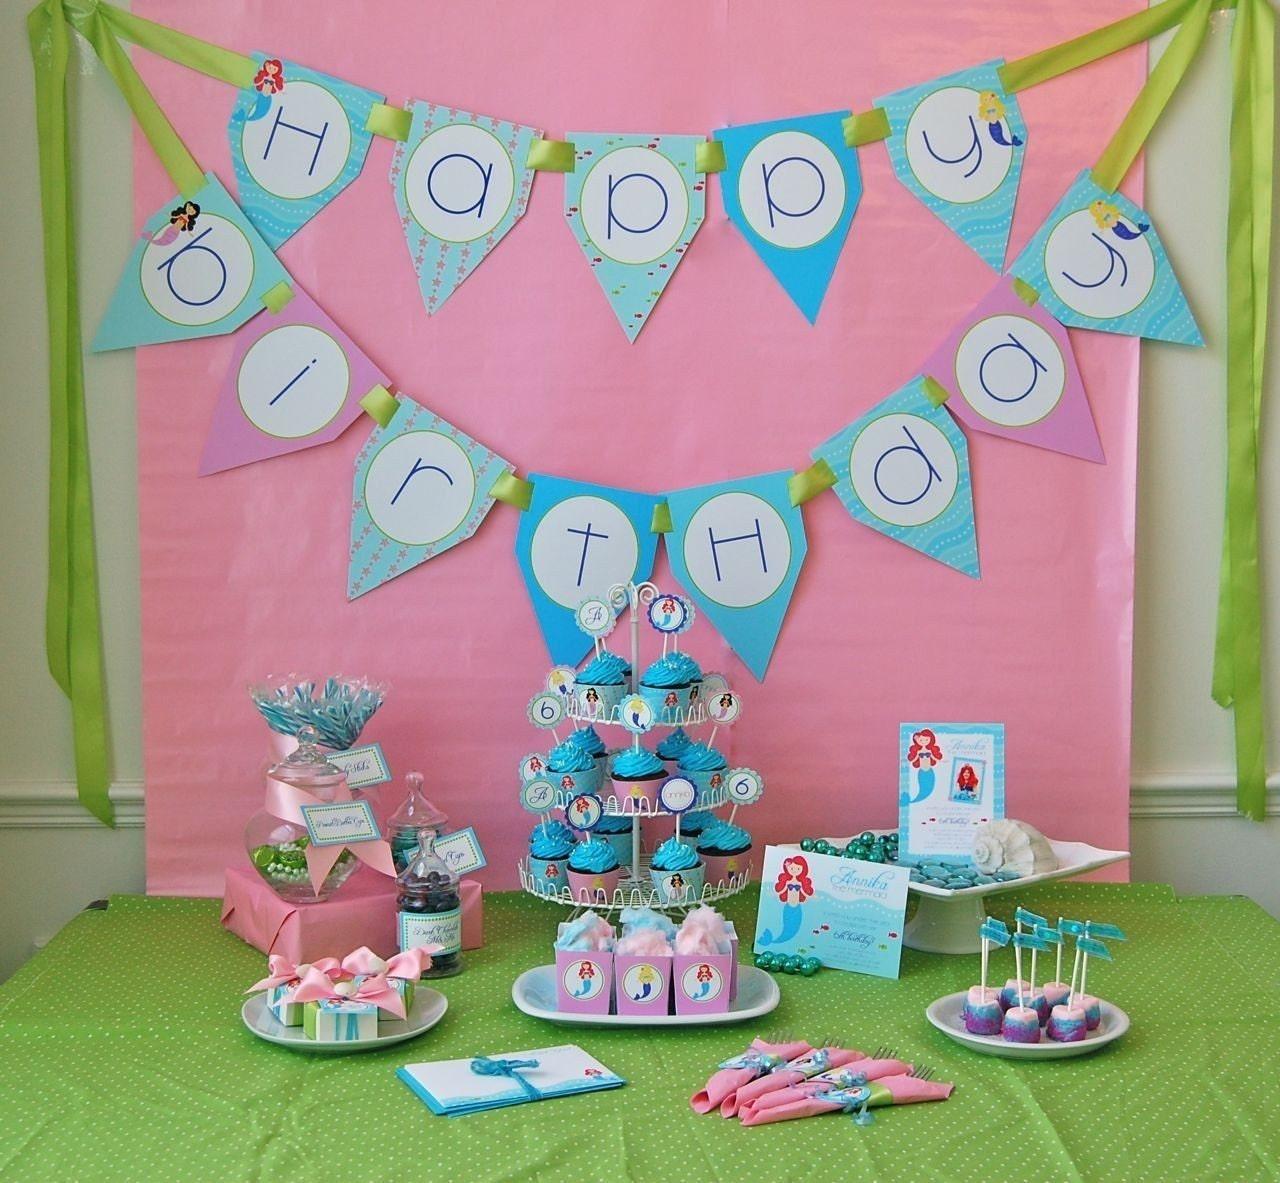 Little Mermaids Happy Birthday Banner DIY Printable